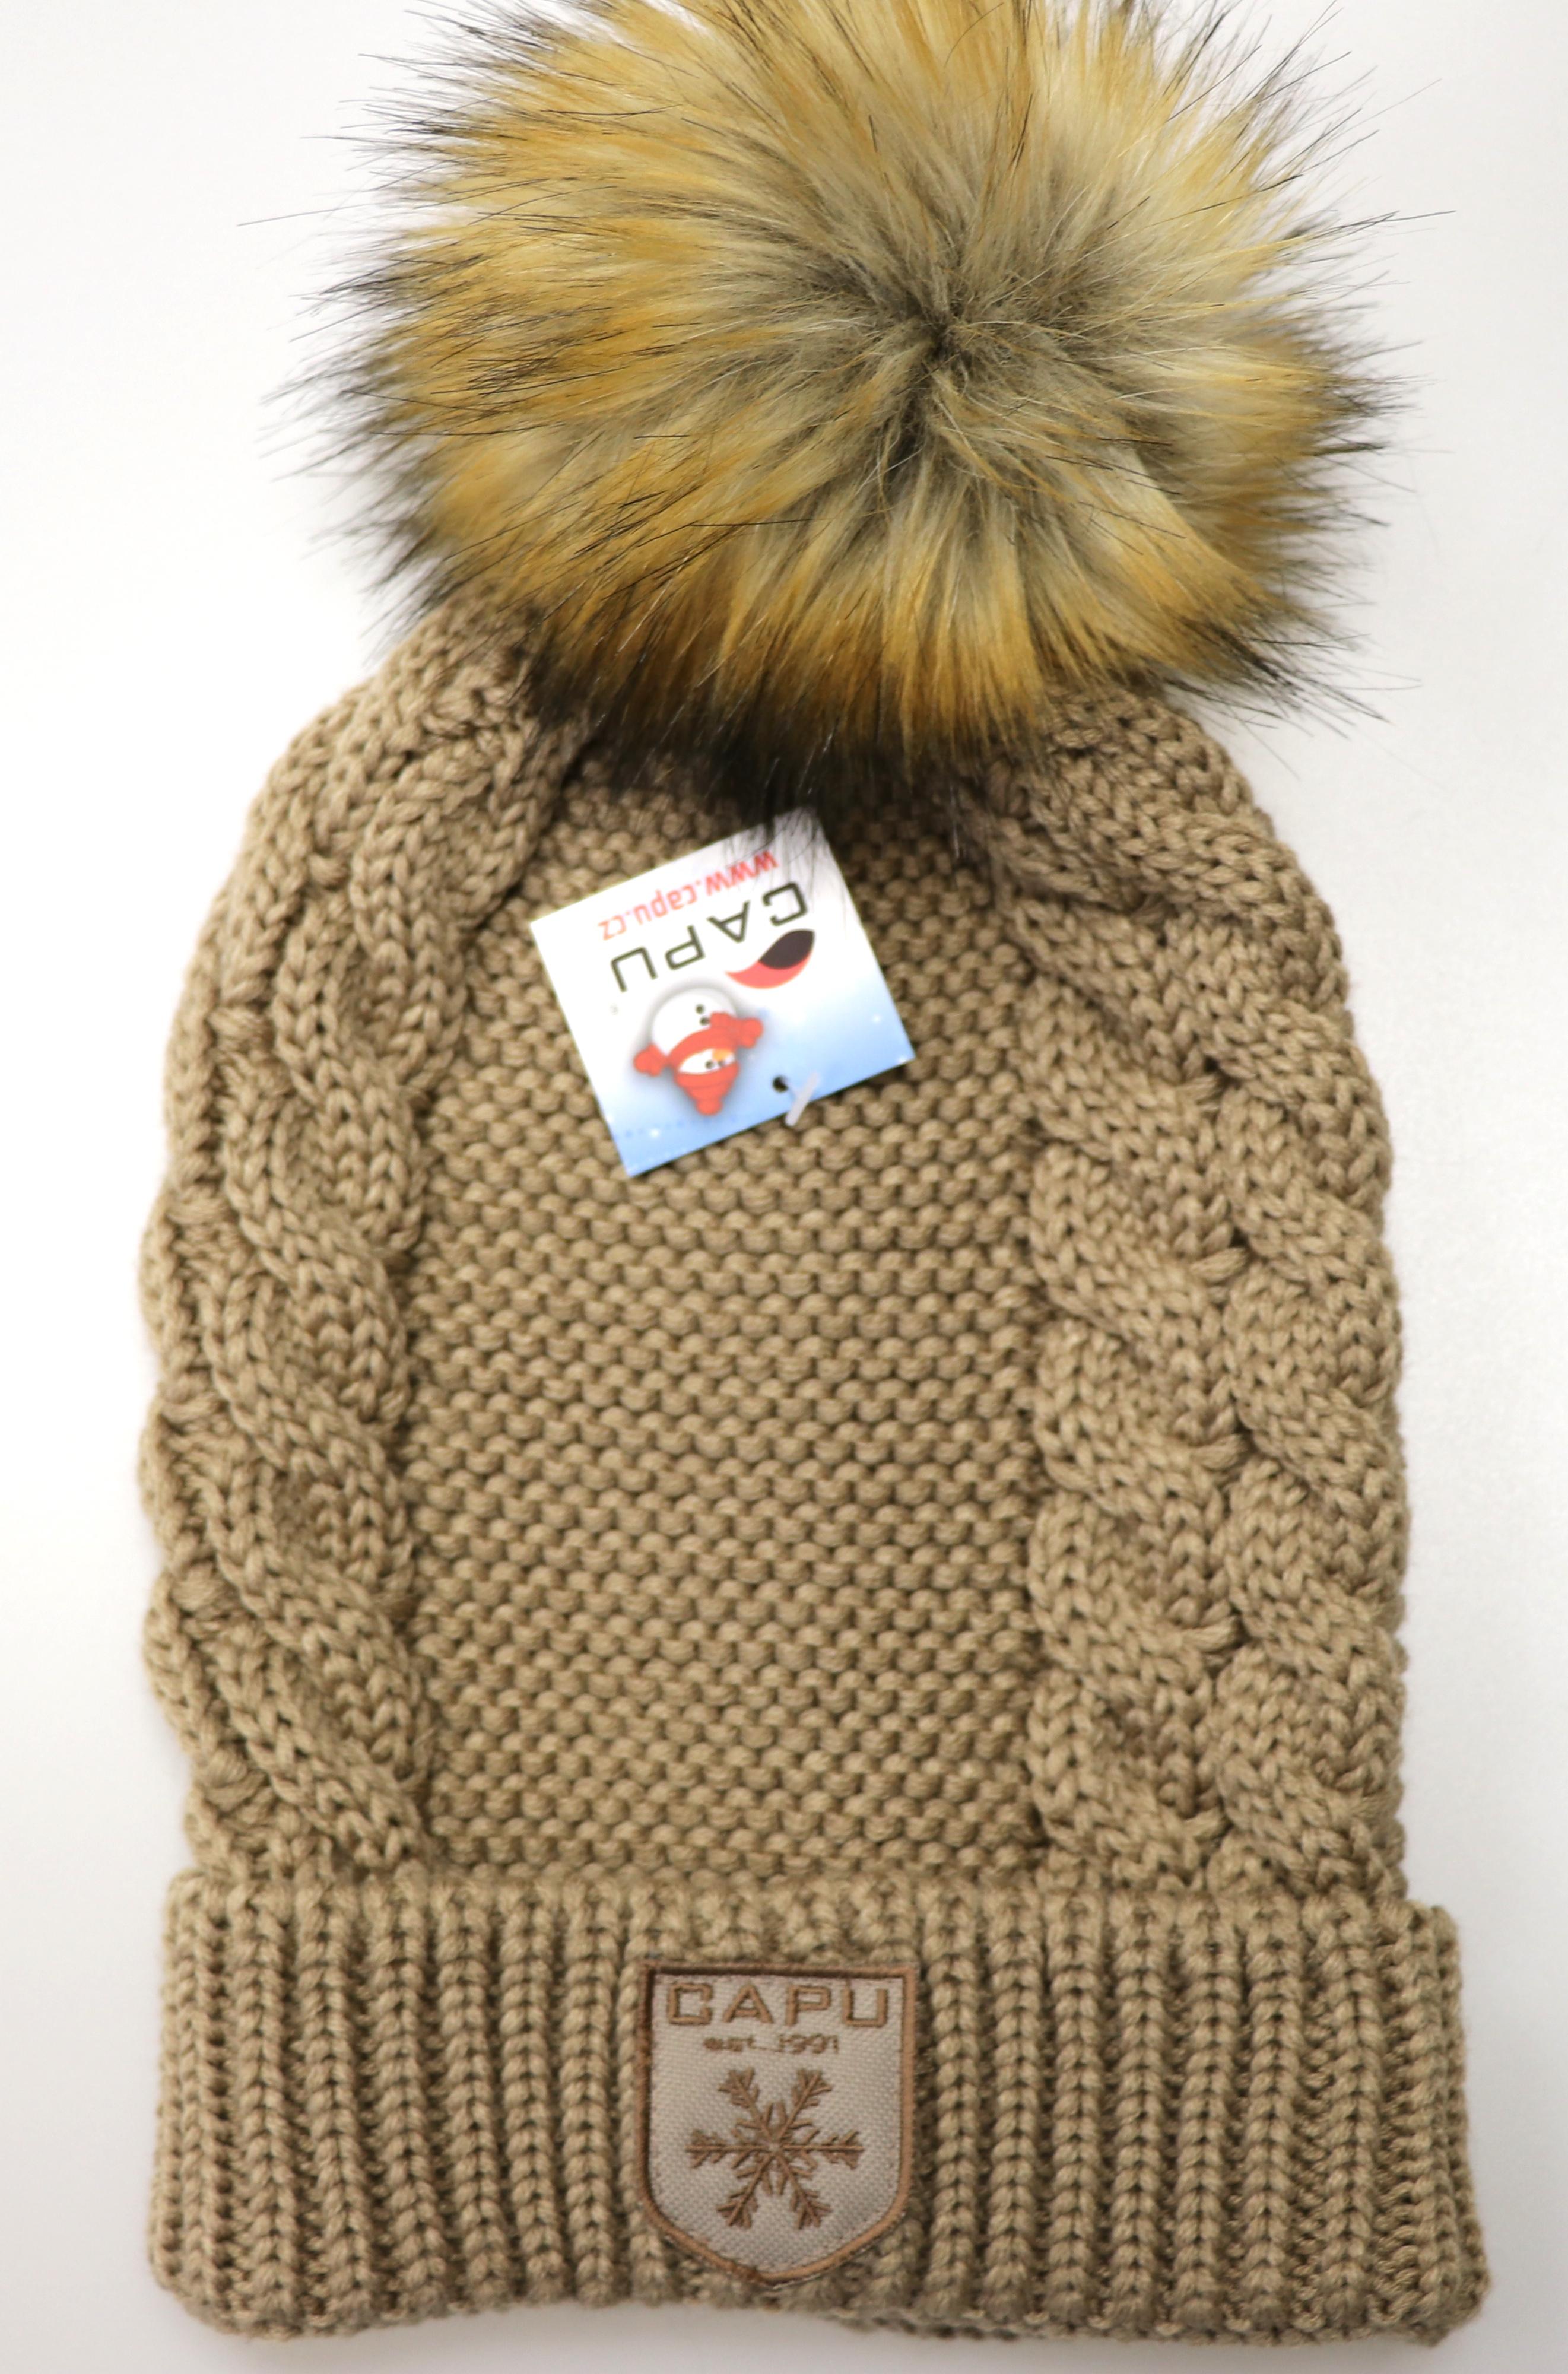 2981de9eb Detská móda | Zimná čiapka s brmbolcom CAPU 1003 hnedá | Mayoral ...